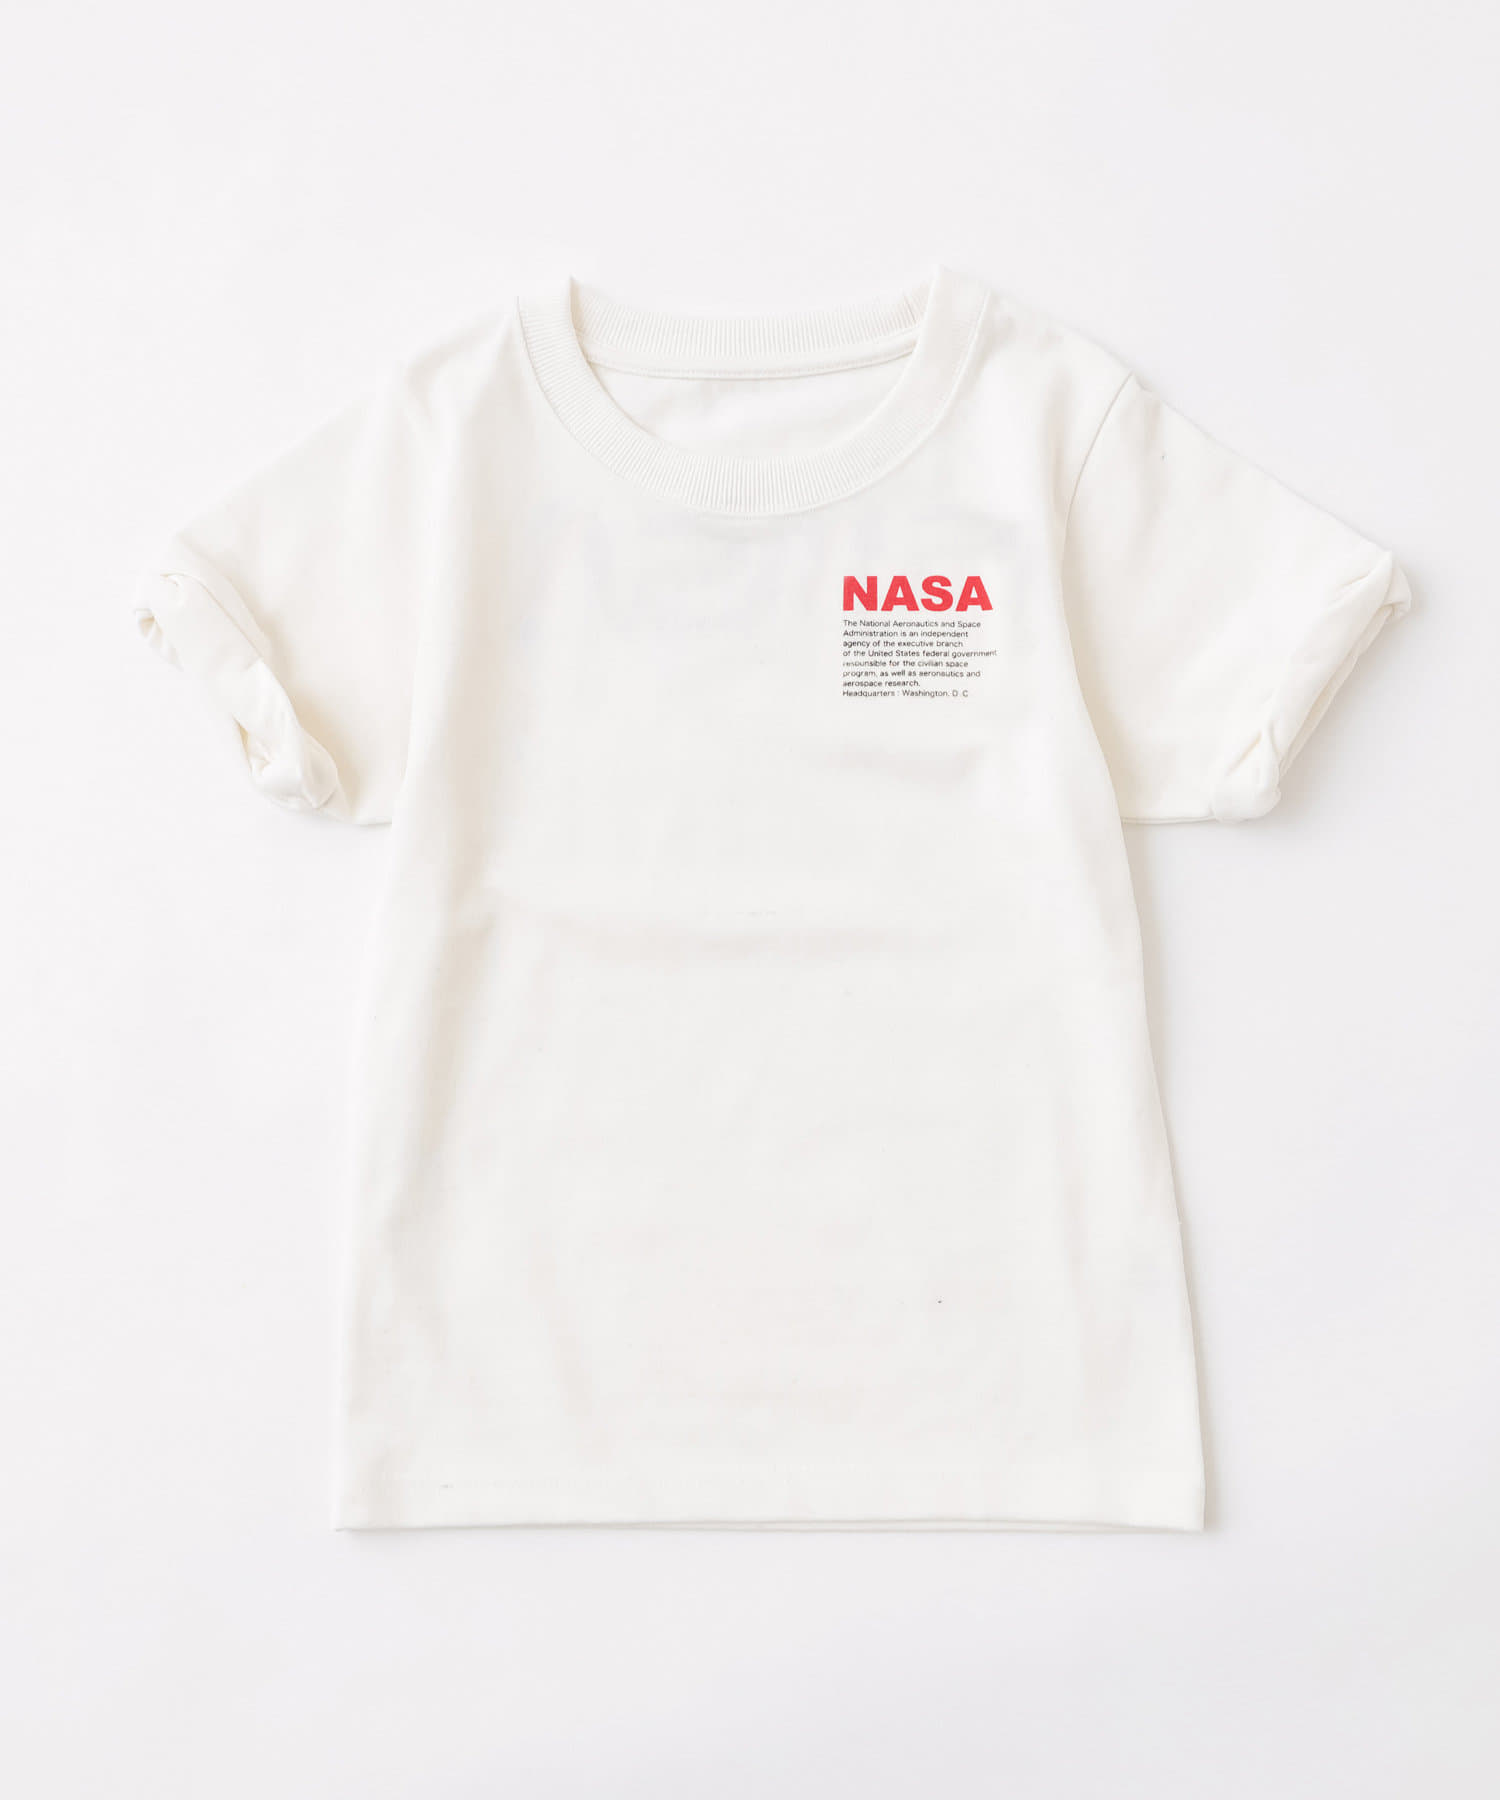 who's who Chico(フーズフーチコ) Kids NASAバックロゴ半袖Tシャツ